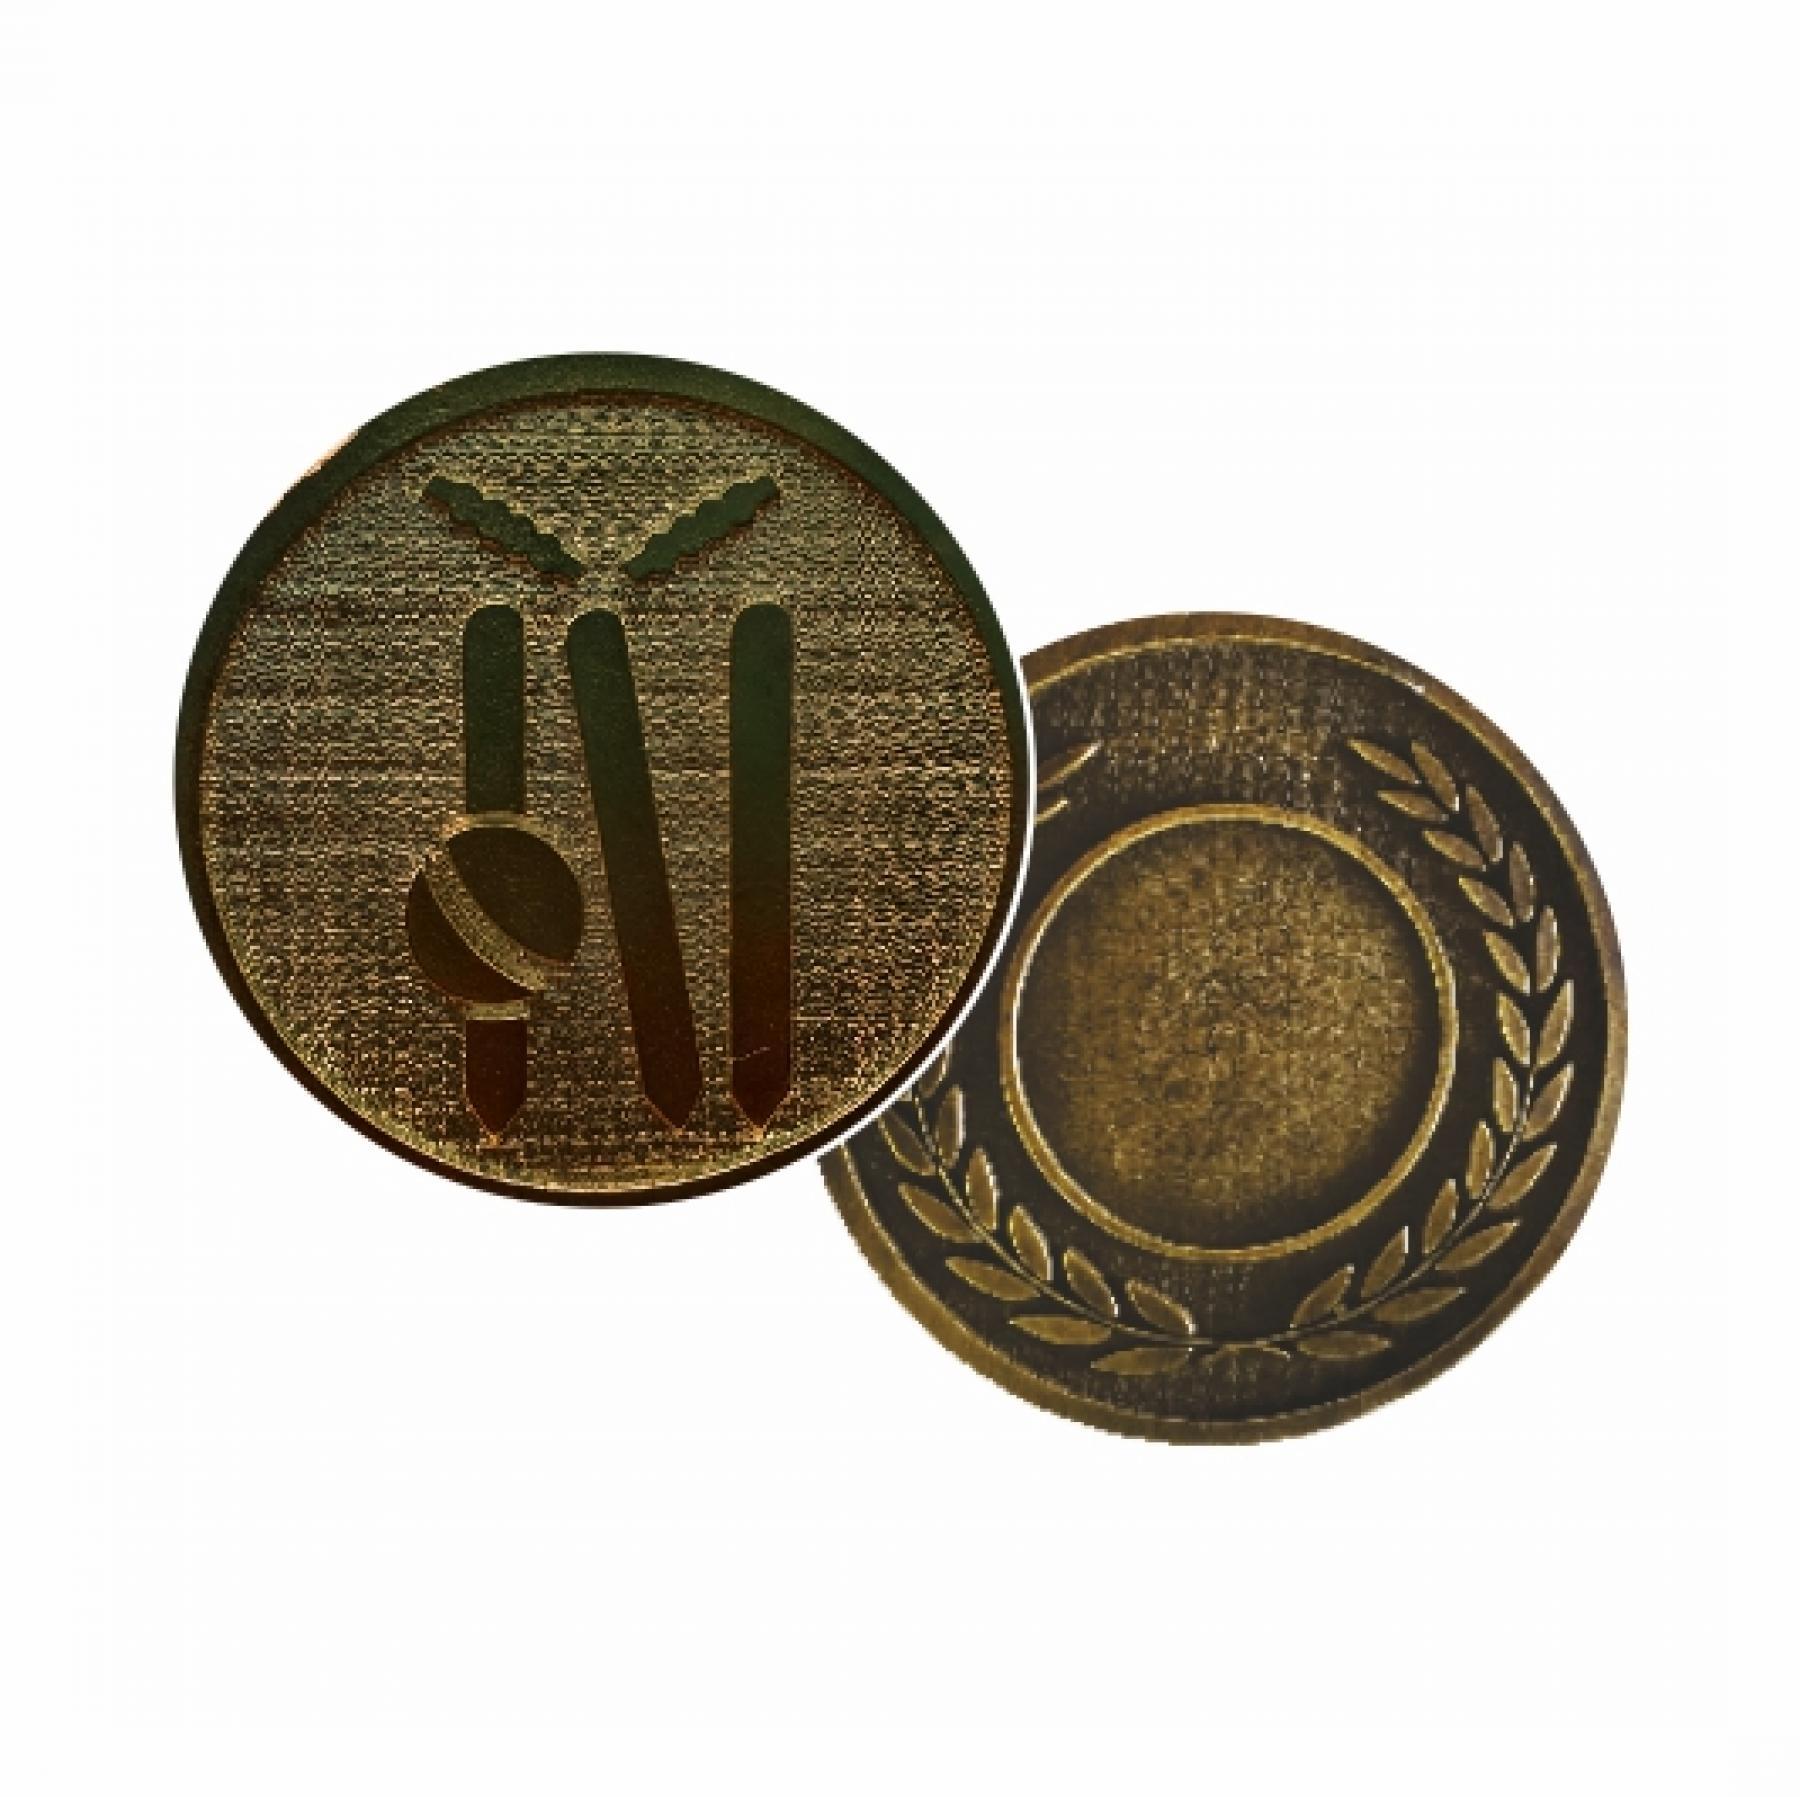 Xco Plated Medals Cricket Bronze